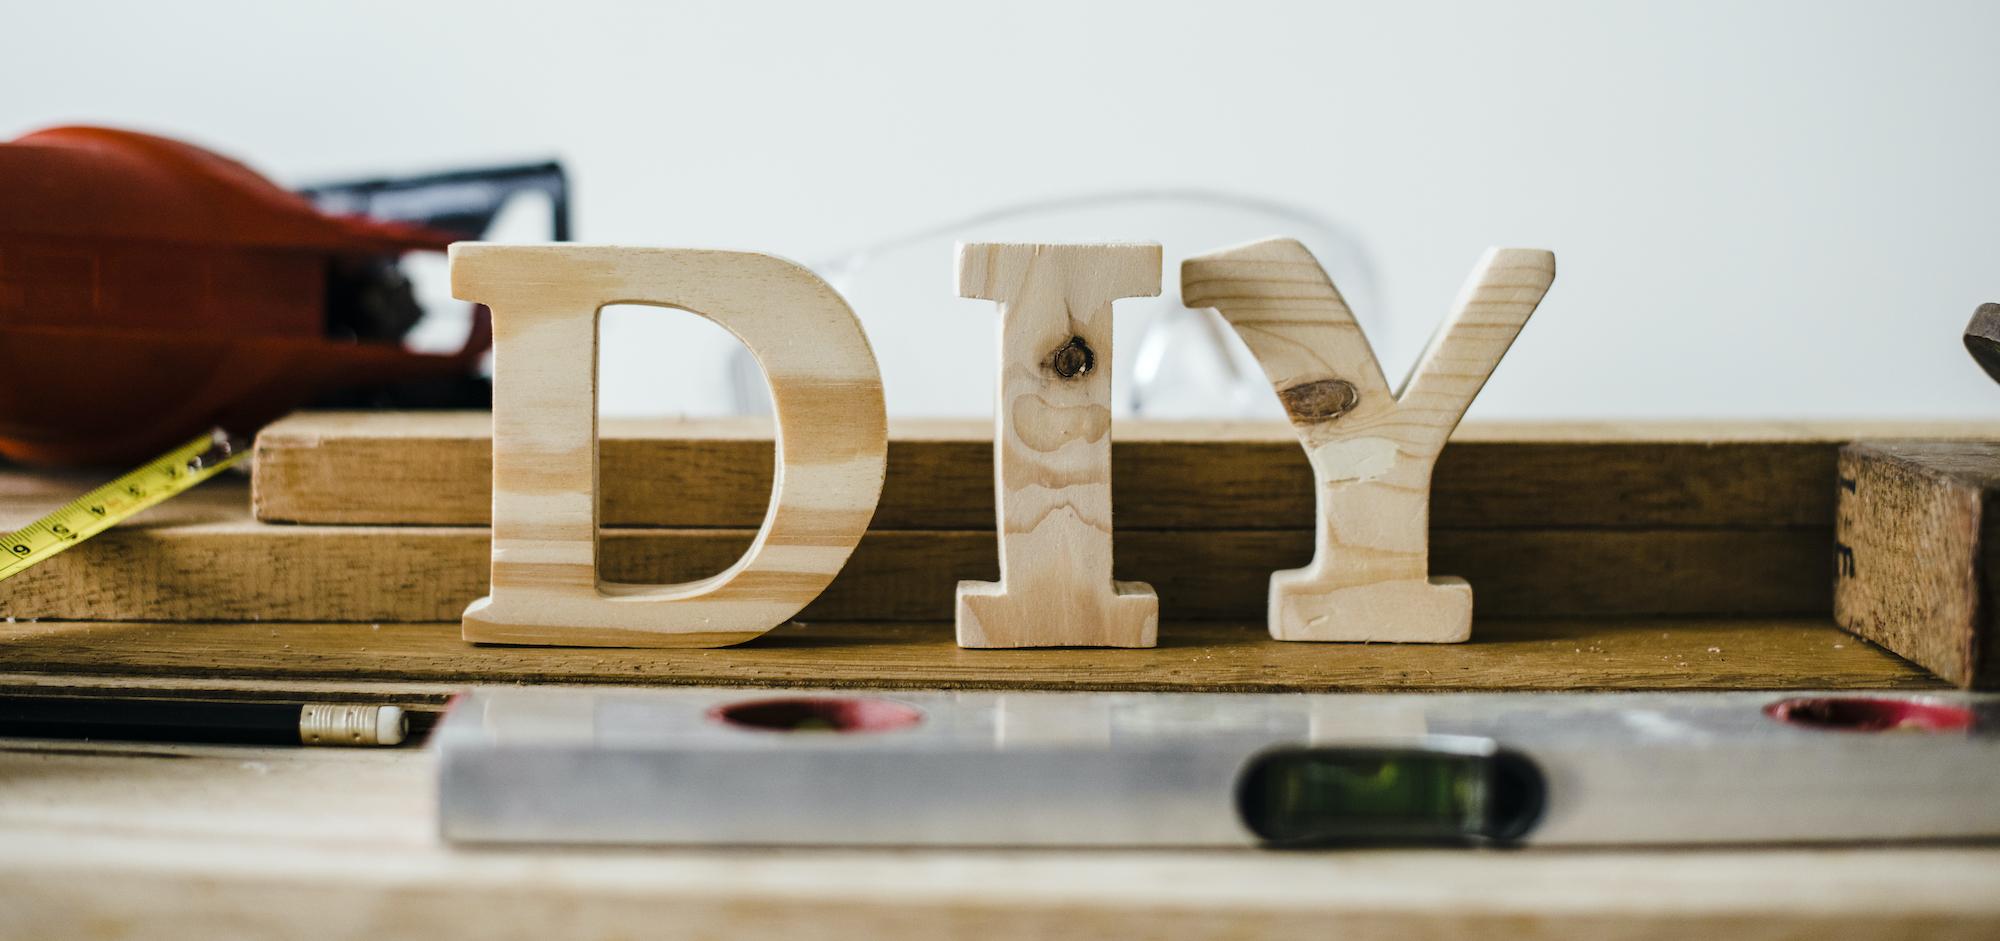 Le do-it-yourself ou DIY